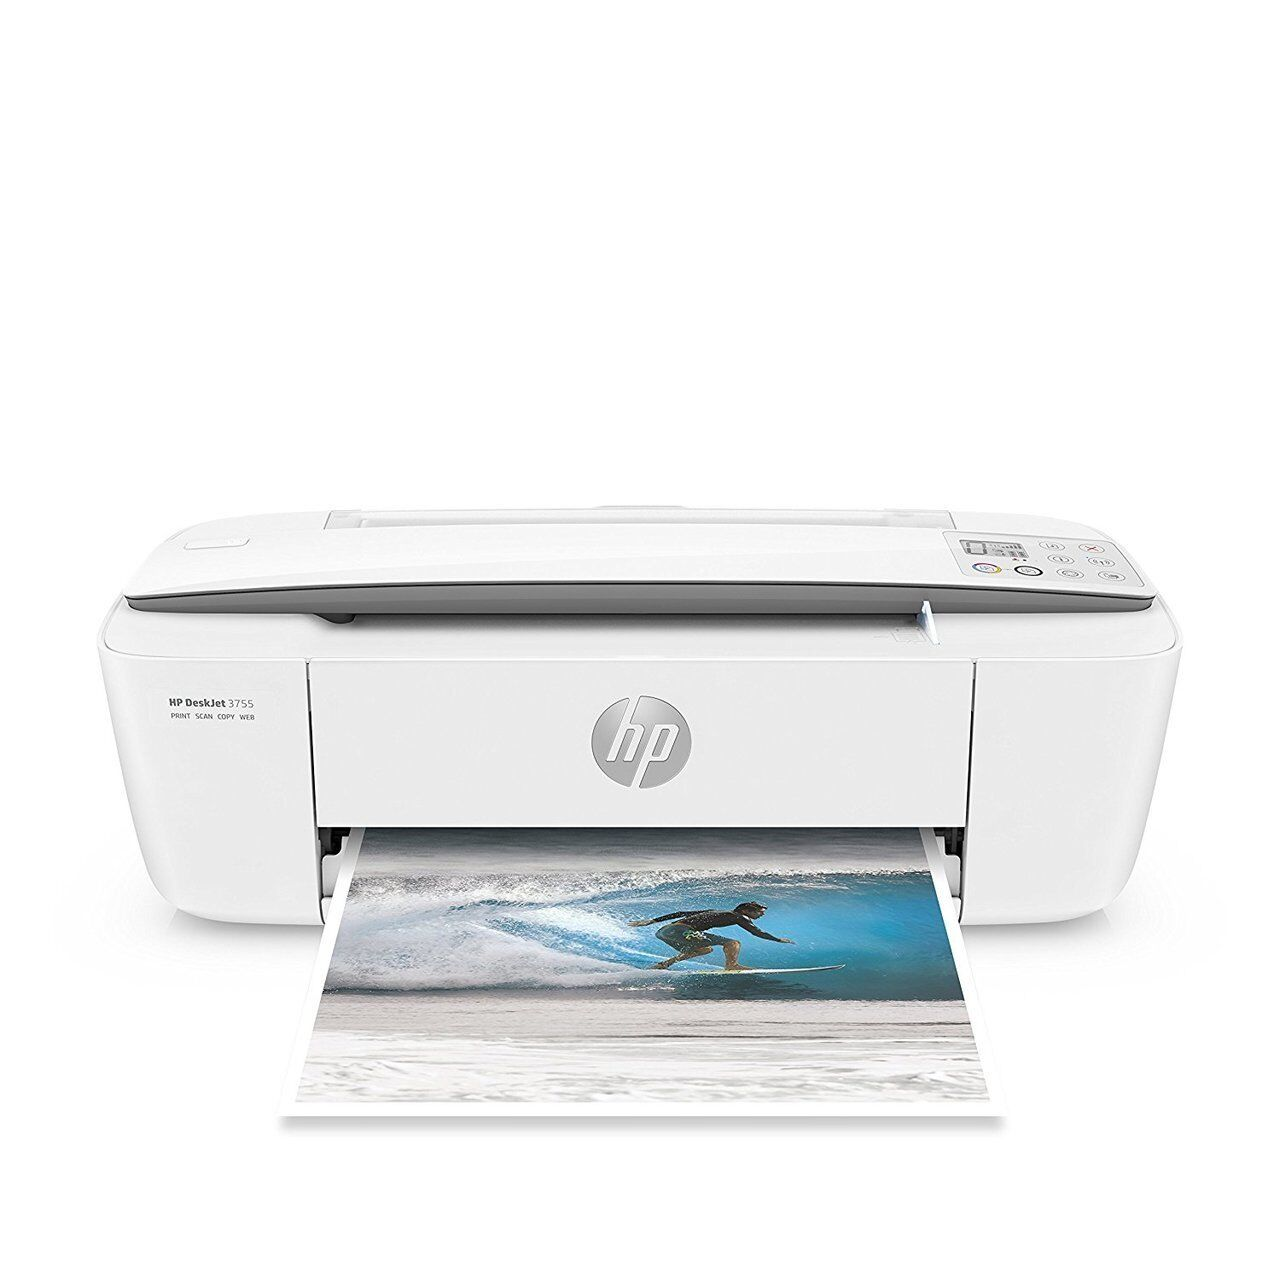 Hp deskjet inkjet computer printers ebay hp deskjet 3755 wireless all in one instant ink printer j9v91a fandeluxe Gallery